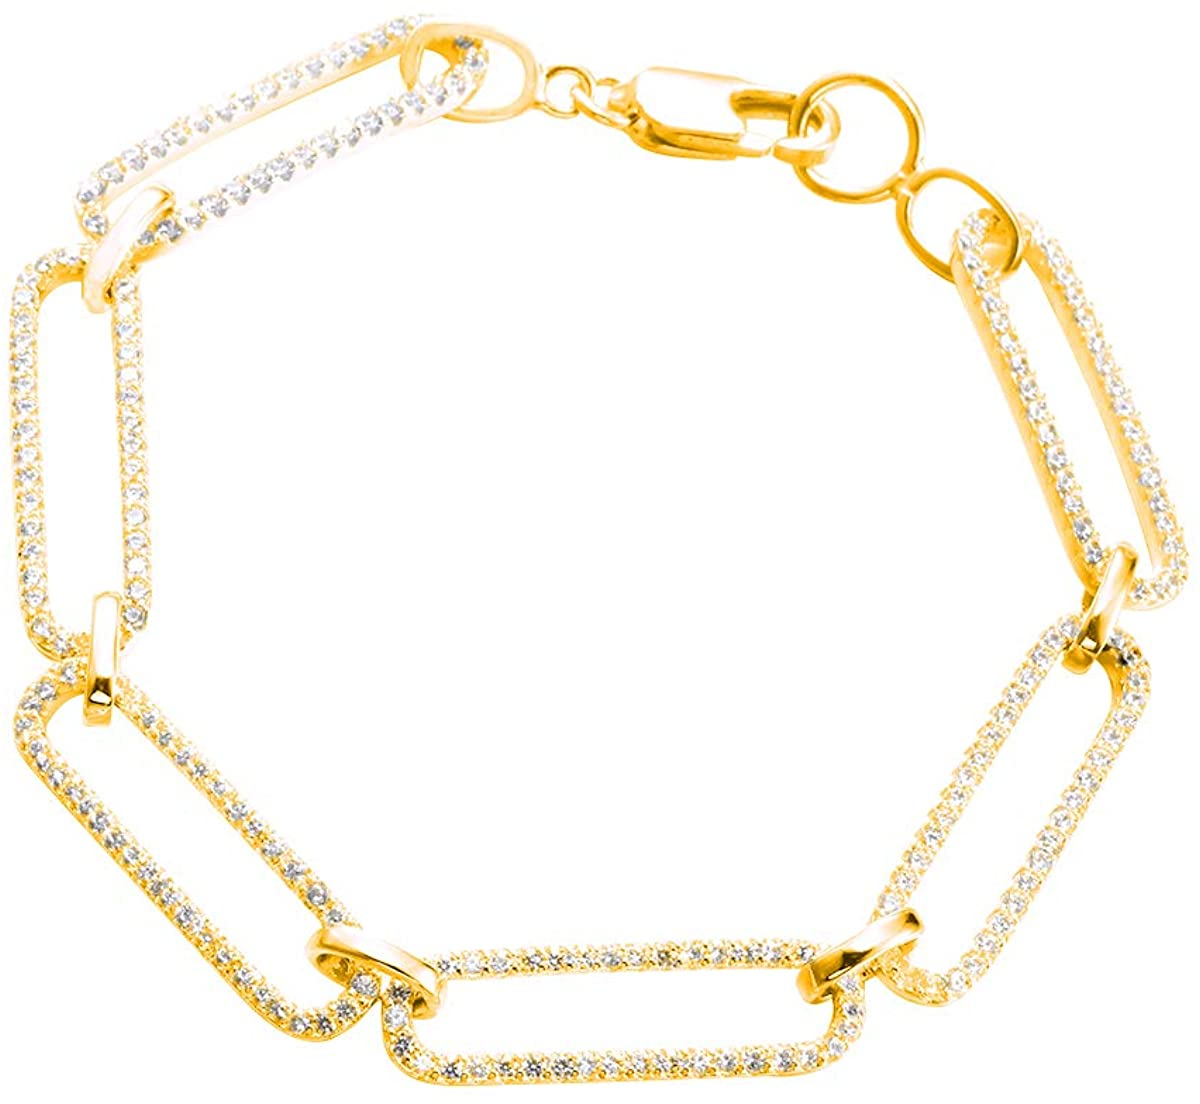 .925 Sterling Silver 6.5MM CZ Paperclip Chain Bracelet - 7